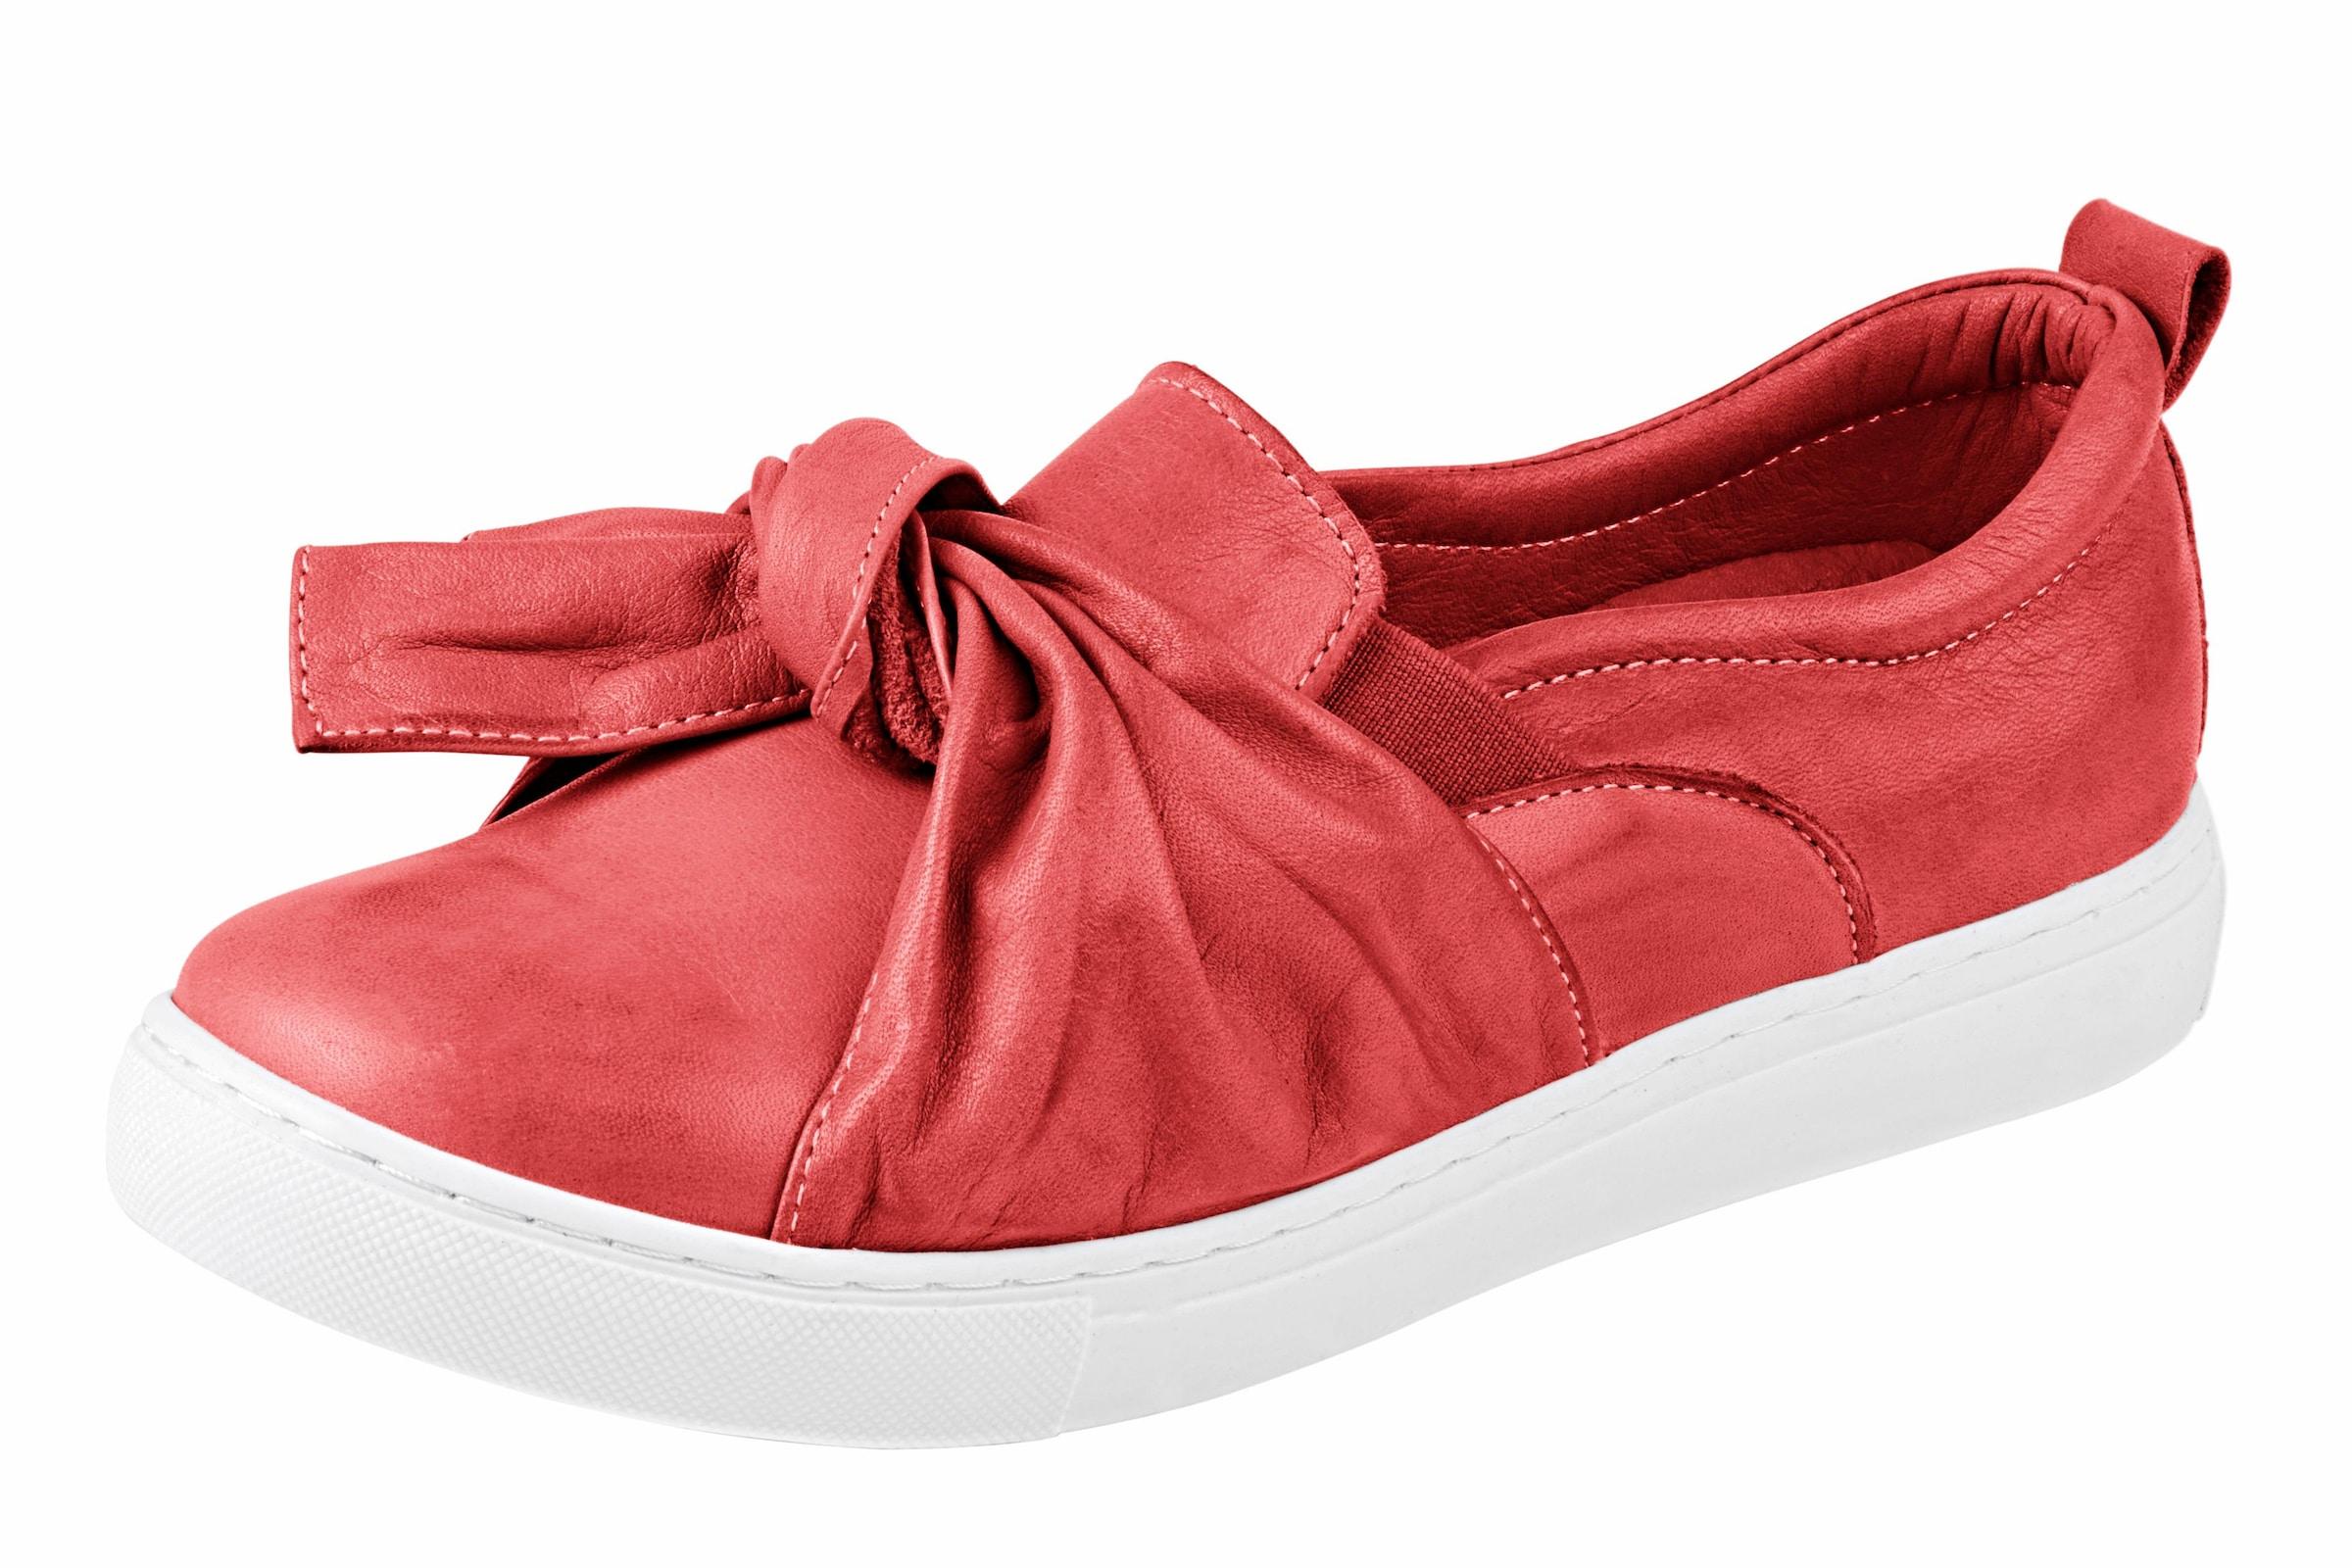 Haltbare Mode billige Schuhe ANDREA CONTI   Slipper Schuhe Gut getragene Schuhe